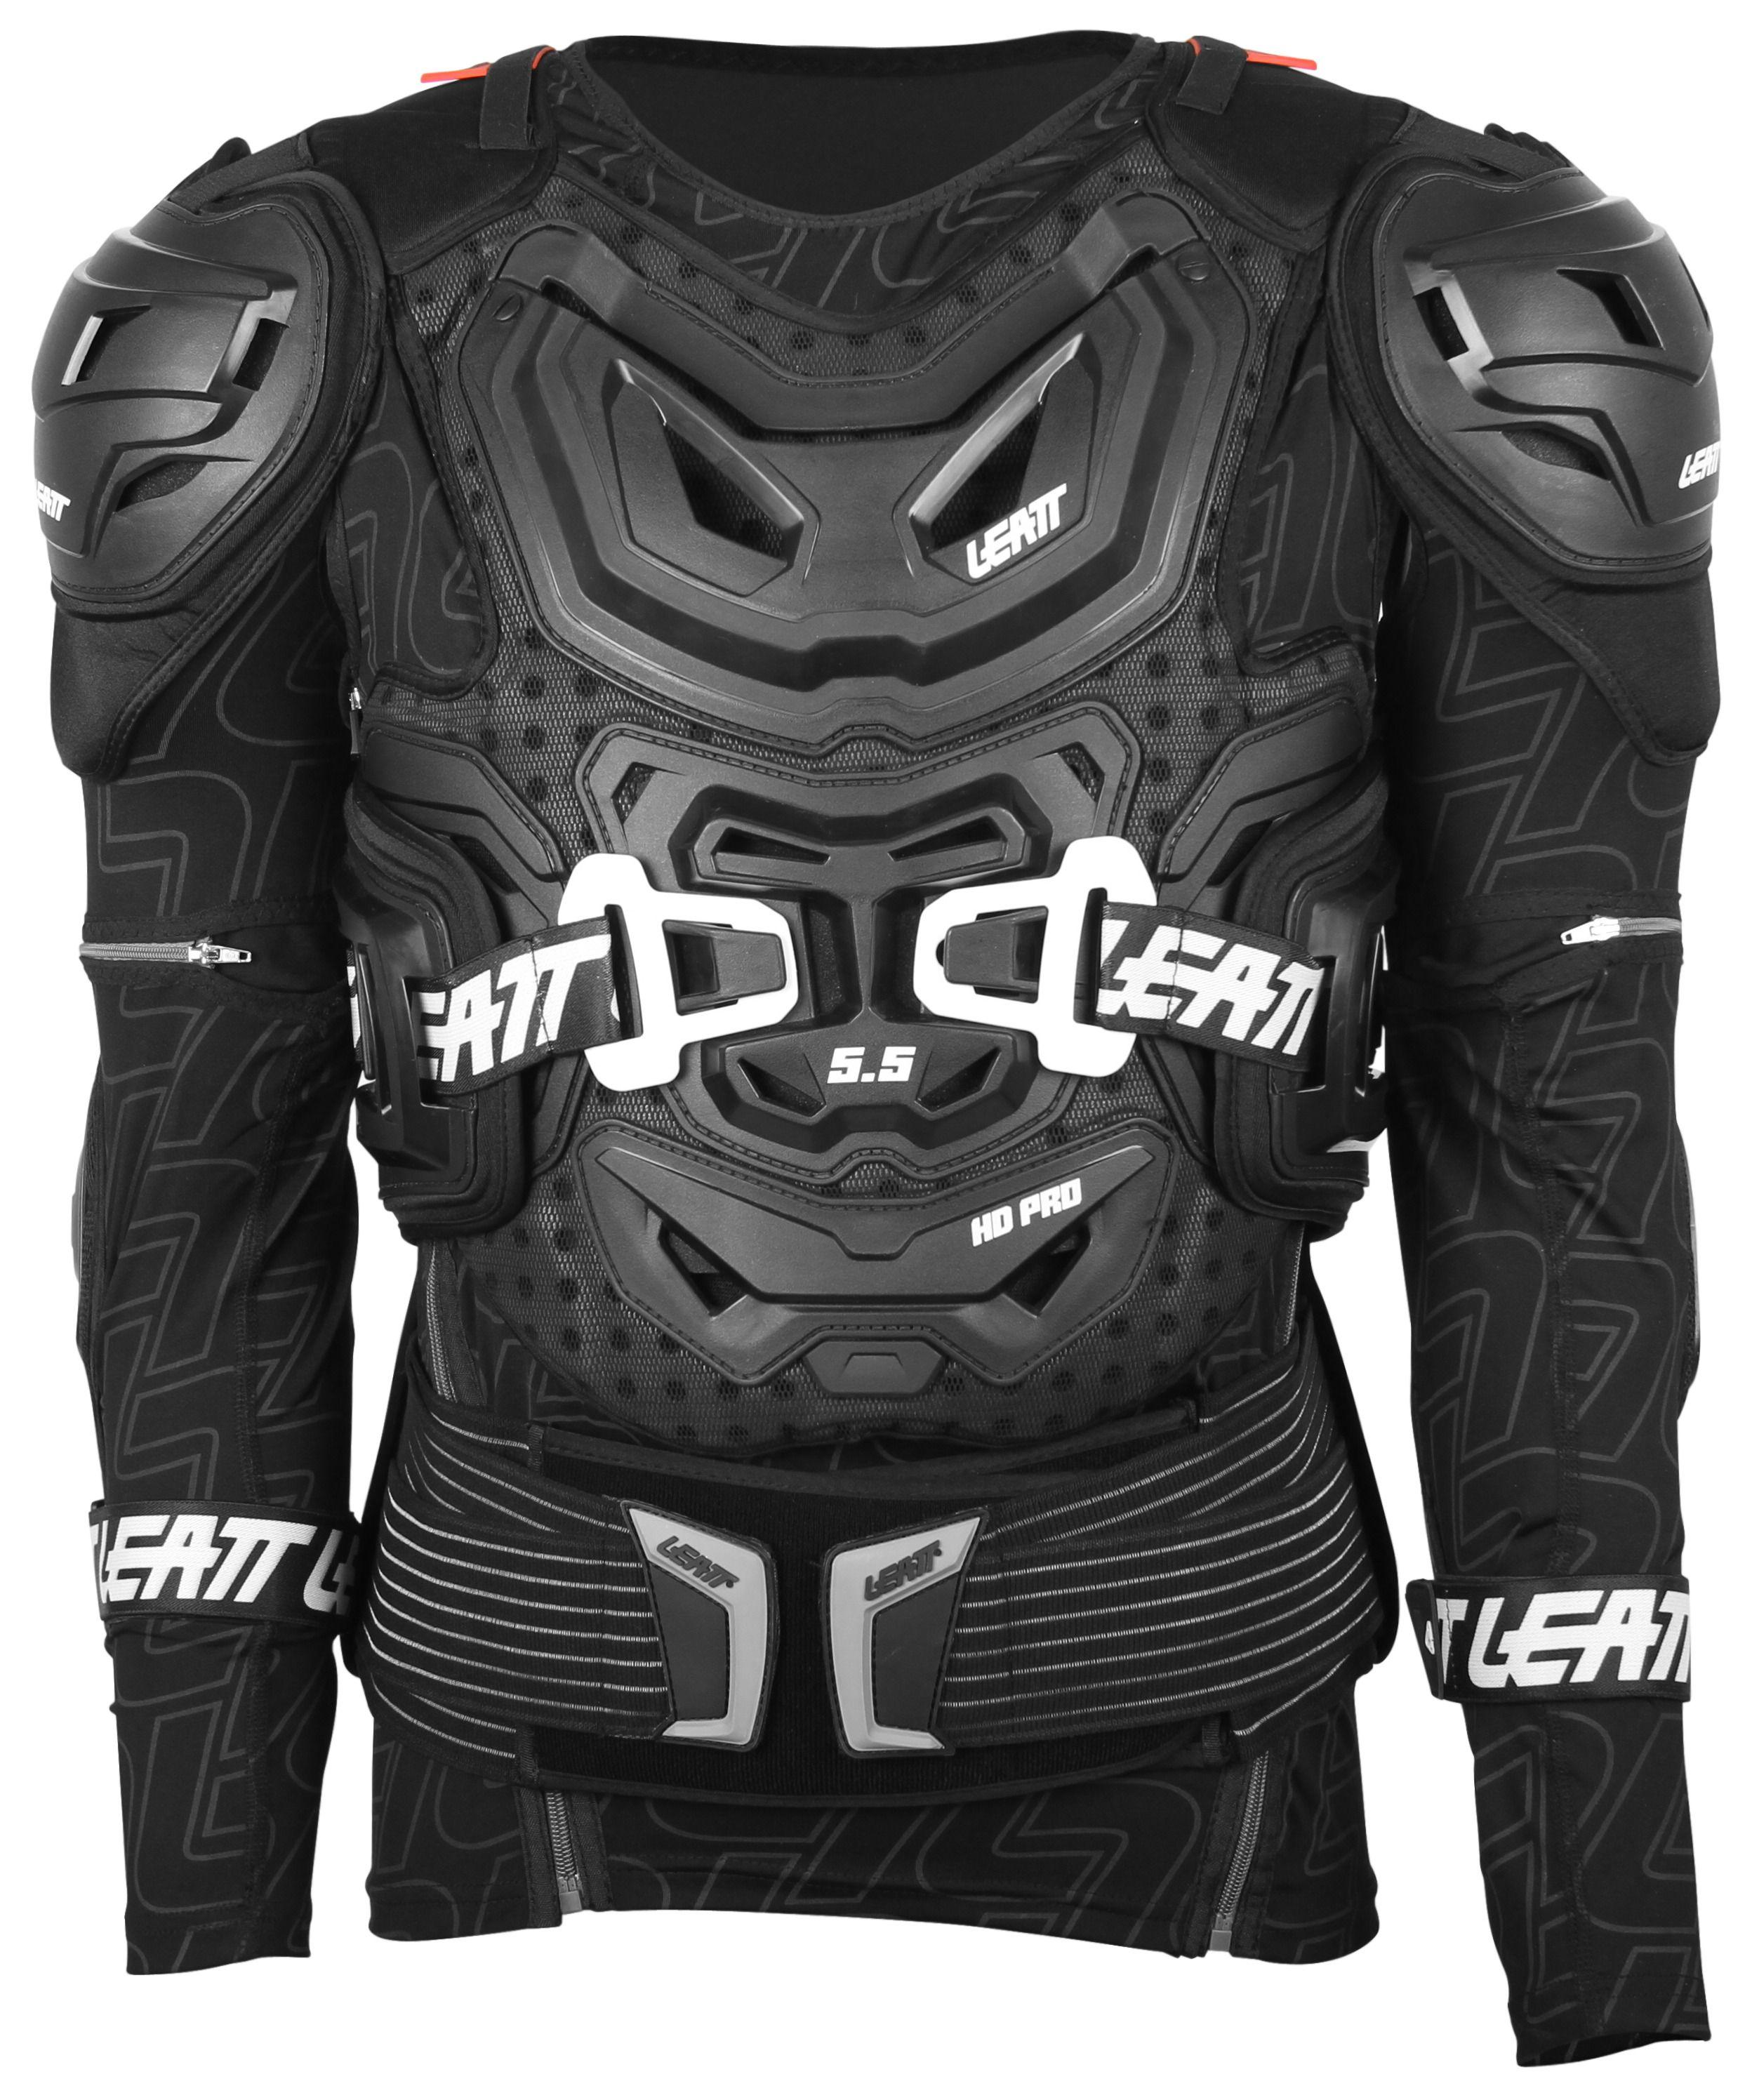 leatt55_body_protector